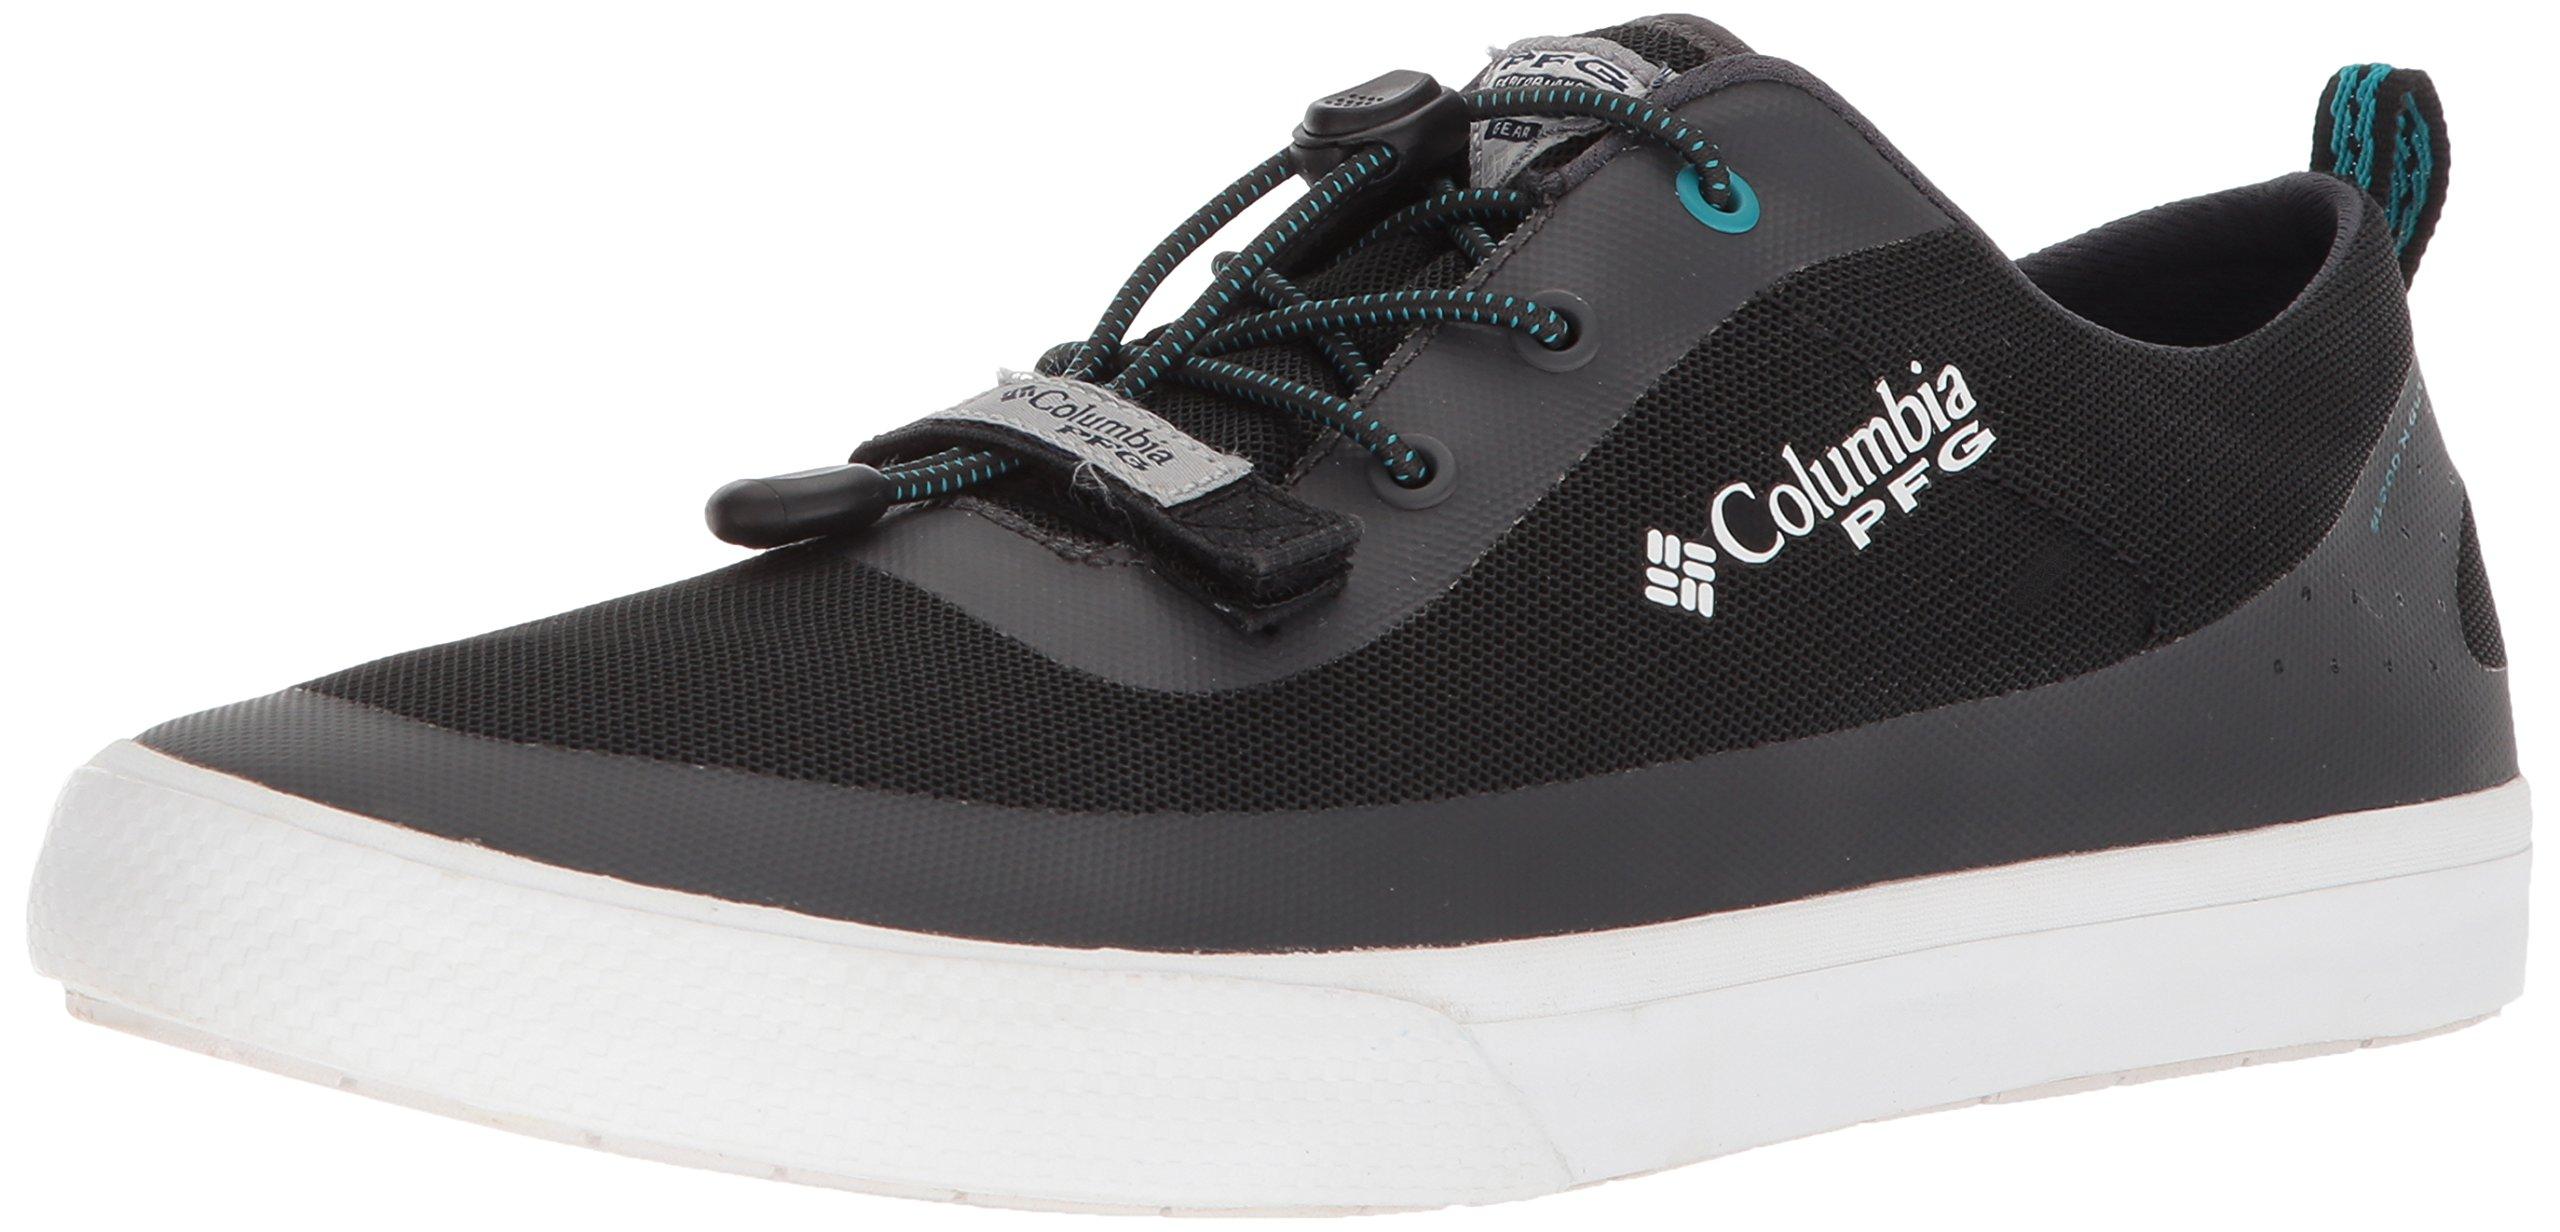 Columbia PFG Men's Dorado CVO PFG Sneaker, Black, Emerald sea, 7 Regular US